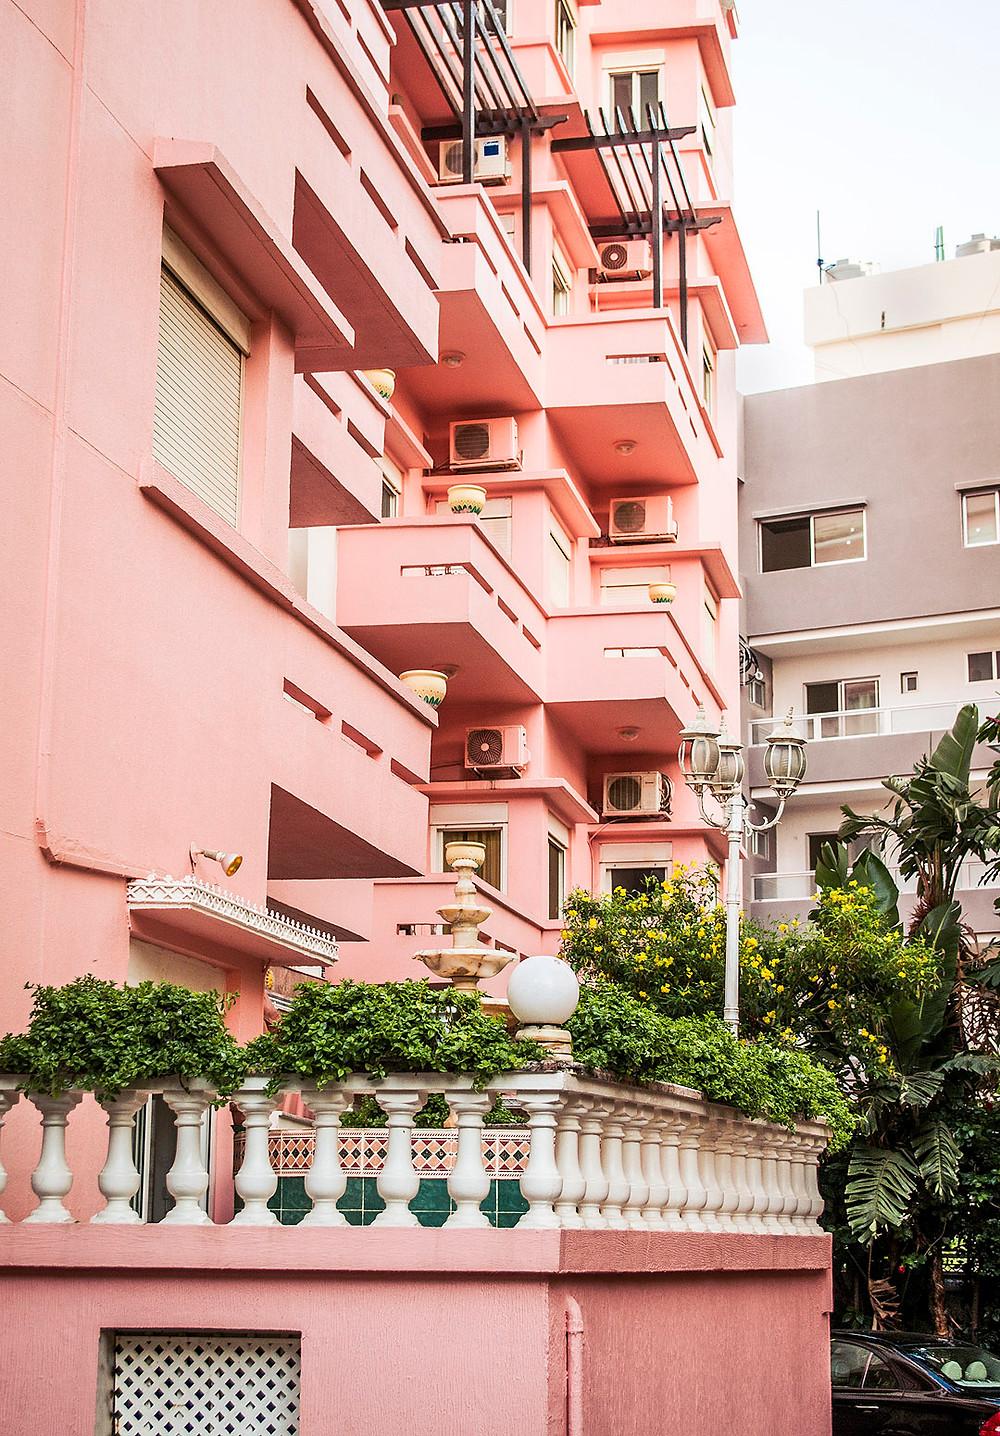 Villa Manara, Ras Beirut, Lebanon